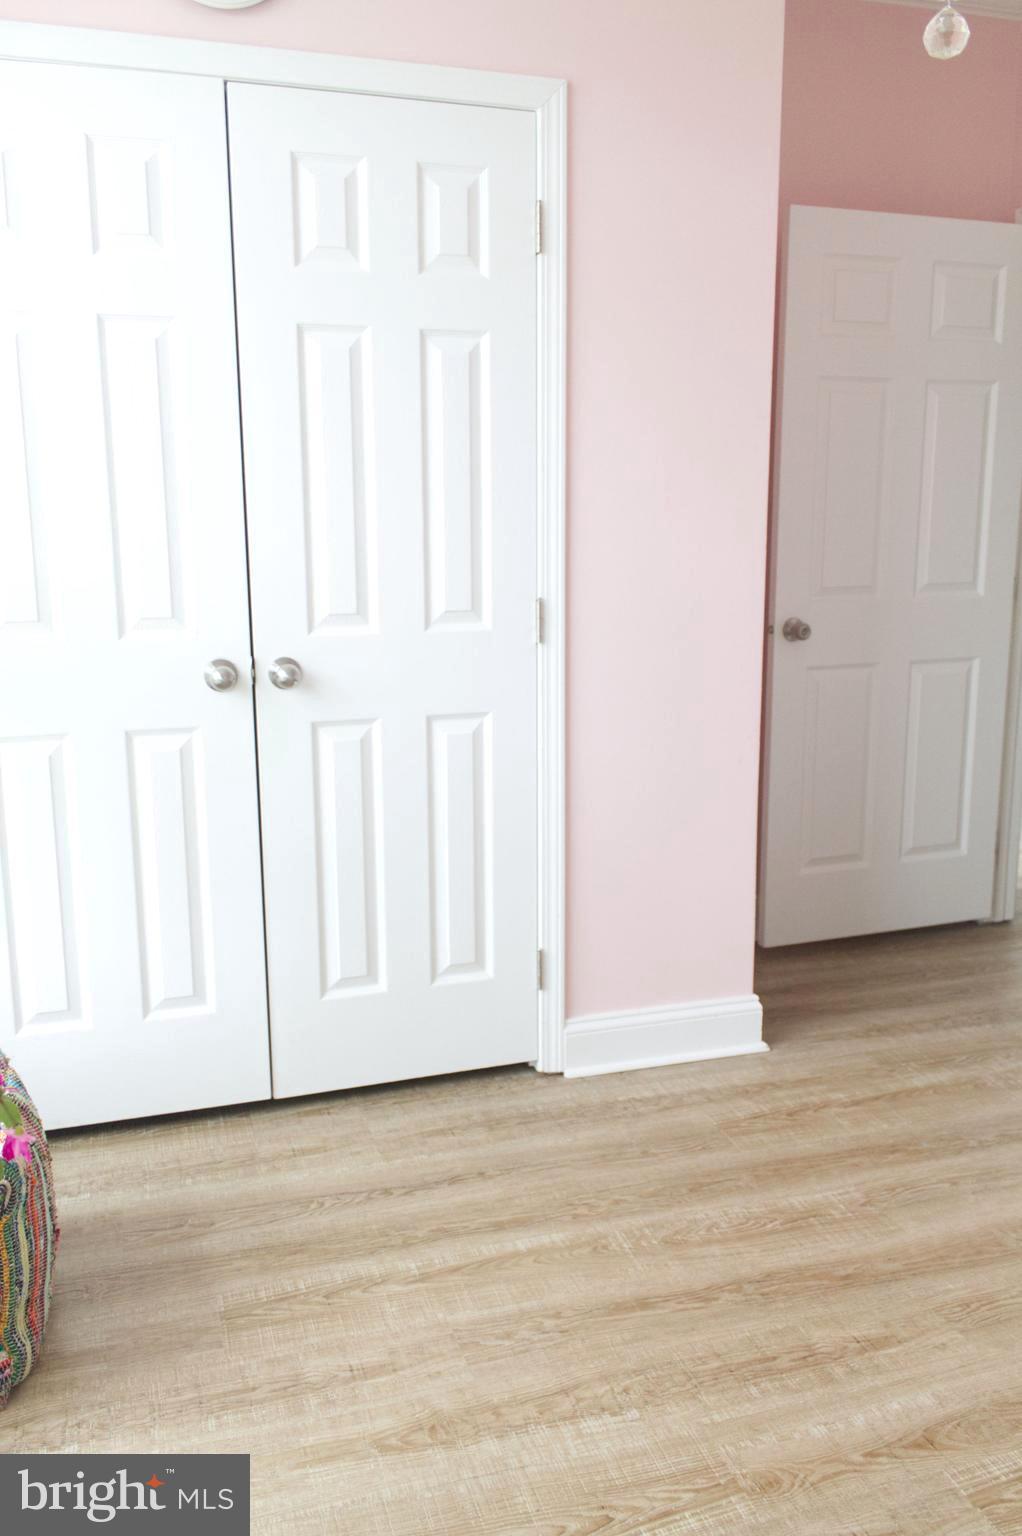 6030 N MAIN STREET, ROCK HALL, Maryland 21661, 3 Bedrooms Bedrooms, ,2 BathroomsBathrooms,Single Family,For Sale,6030 N MAIN STREET,MDKE117586